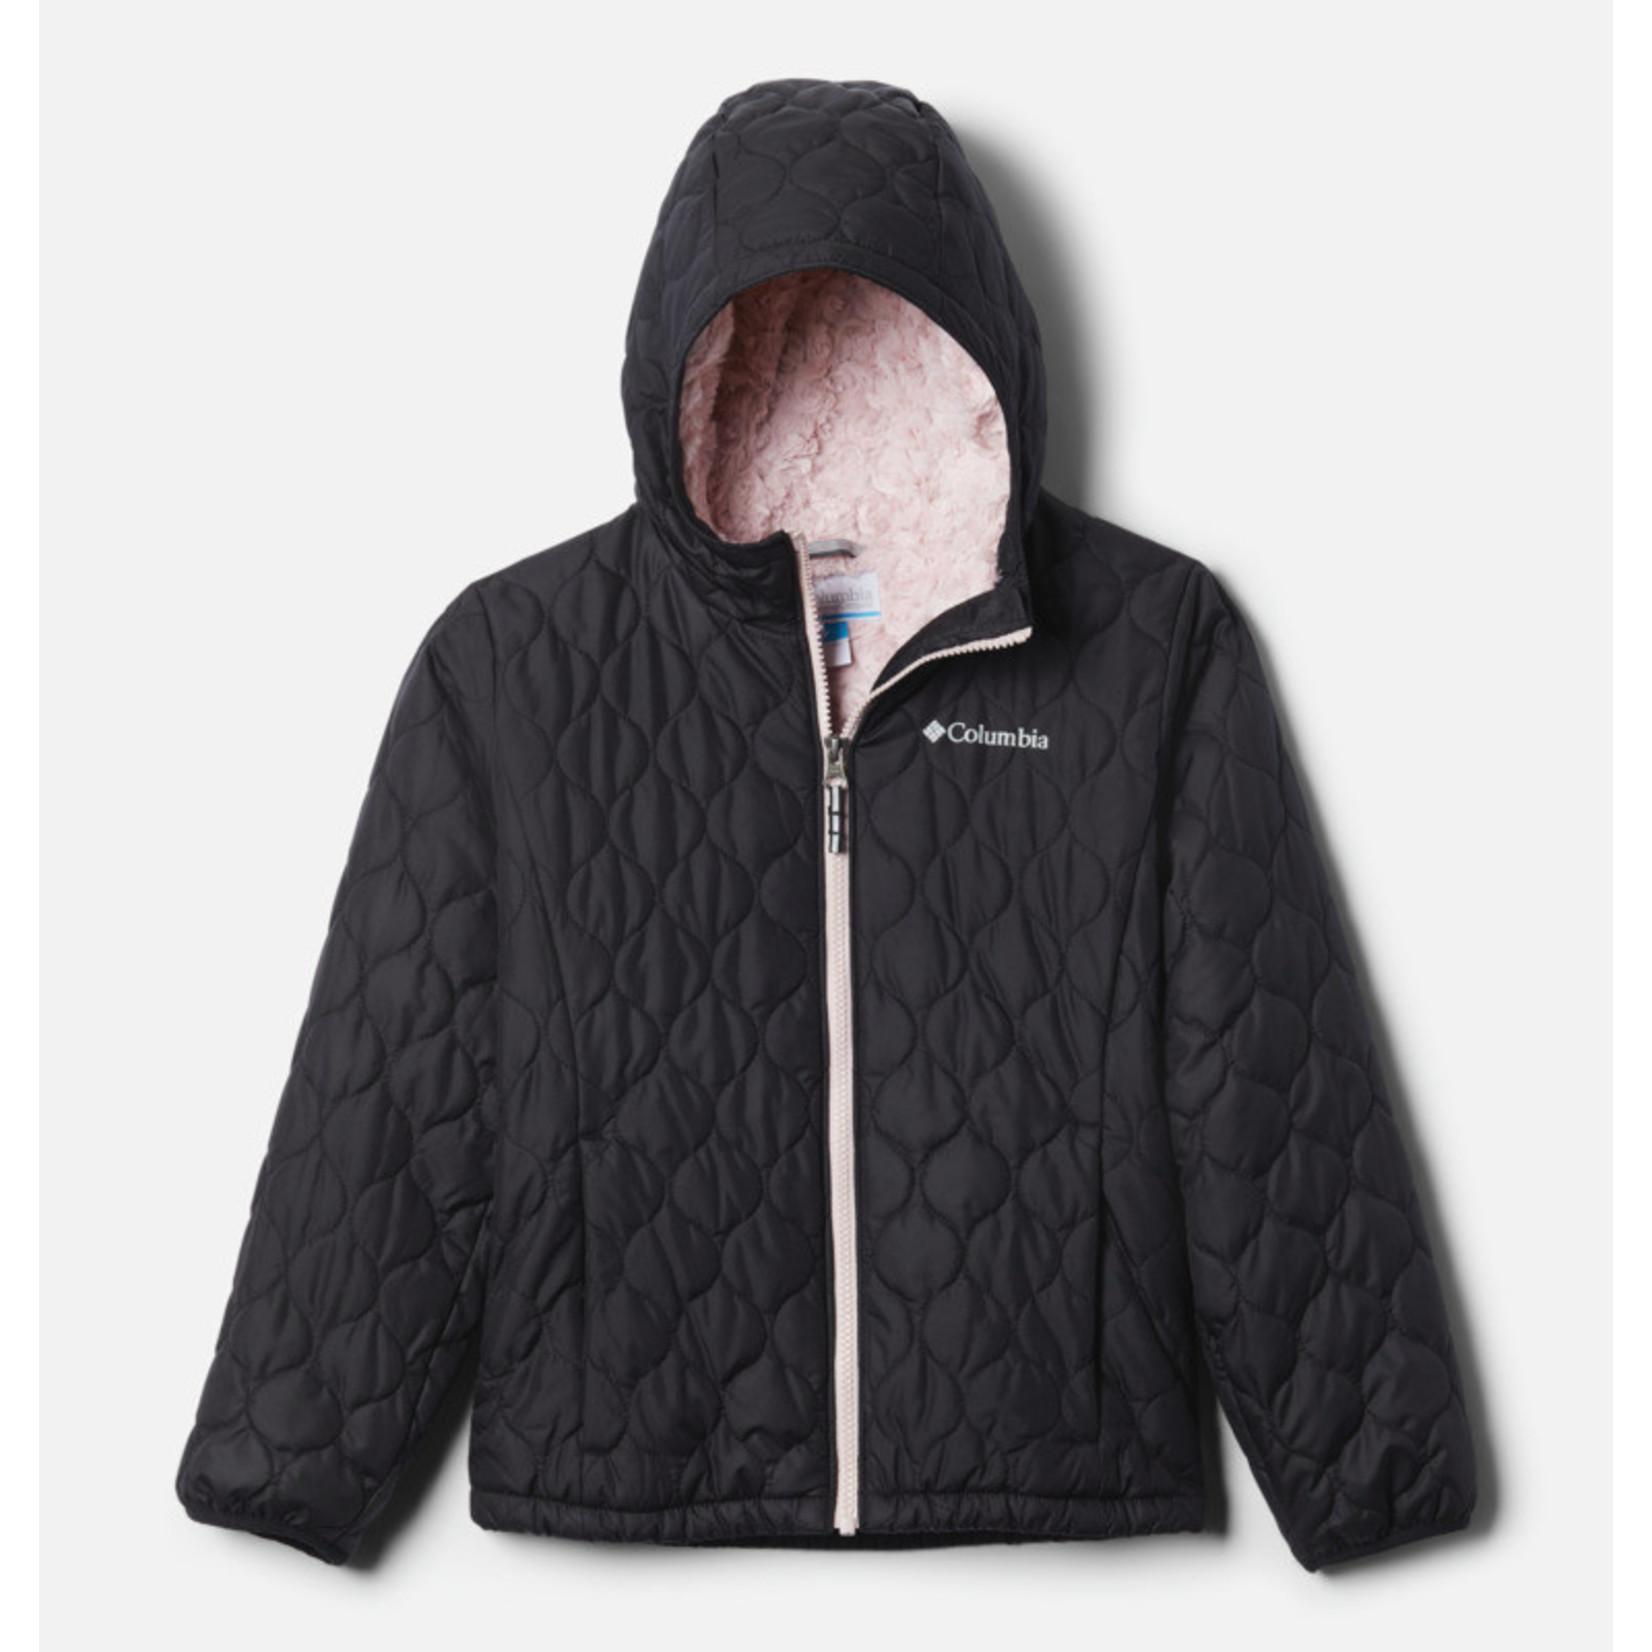 Columbia Columbia Winter Jacket, Bella Plush, Girls